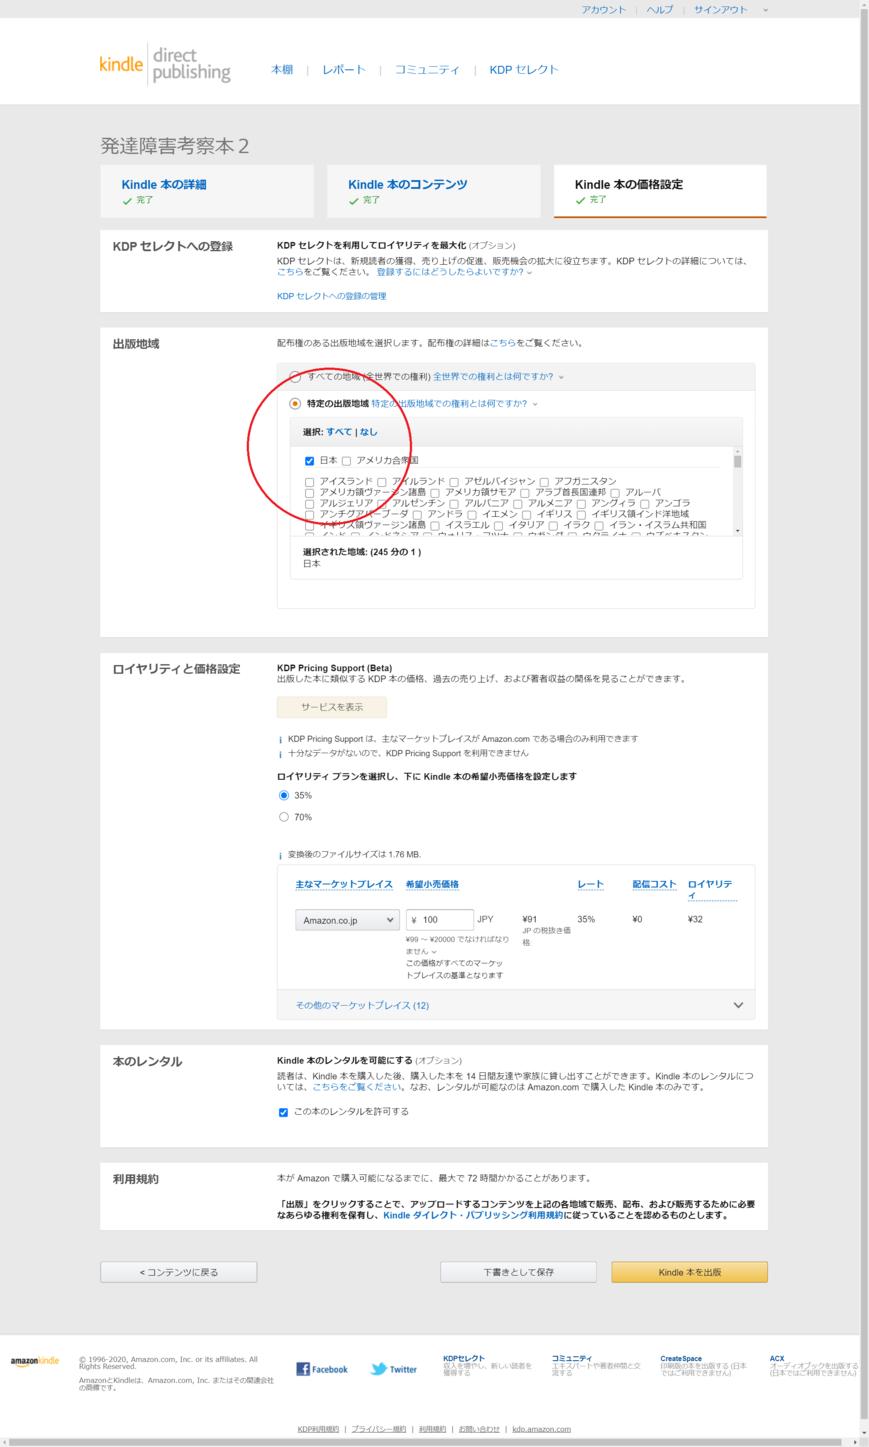 f:id:hyogokurumi:20200629134647p:plain